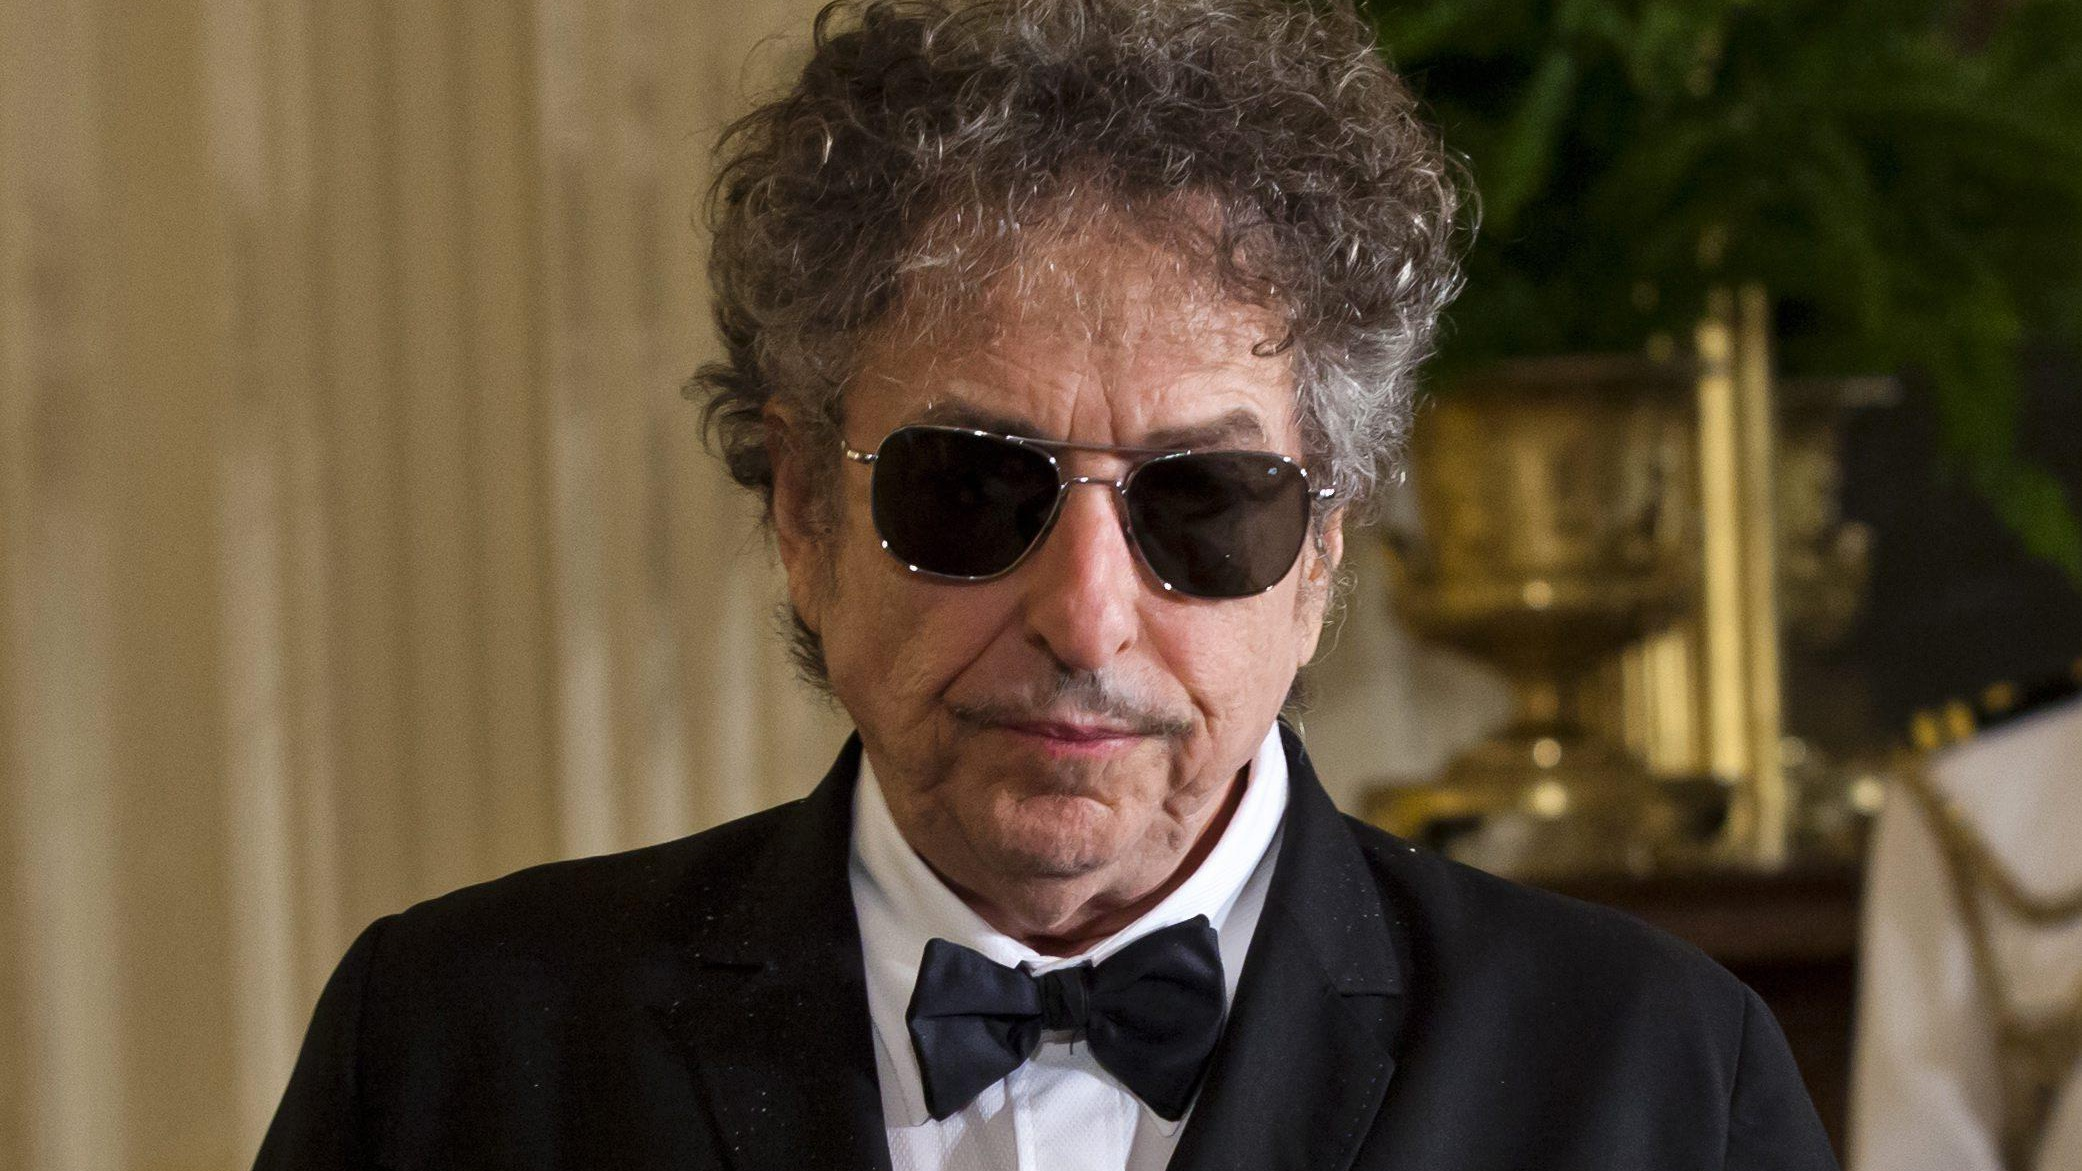 Dylan in Italia, tre nuove date